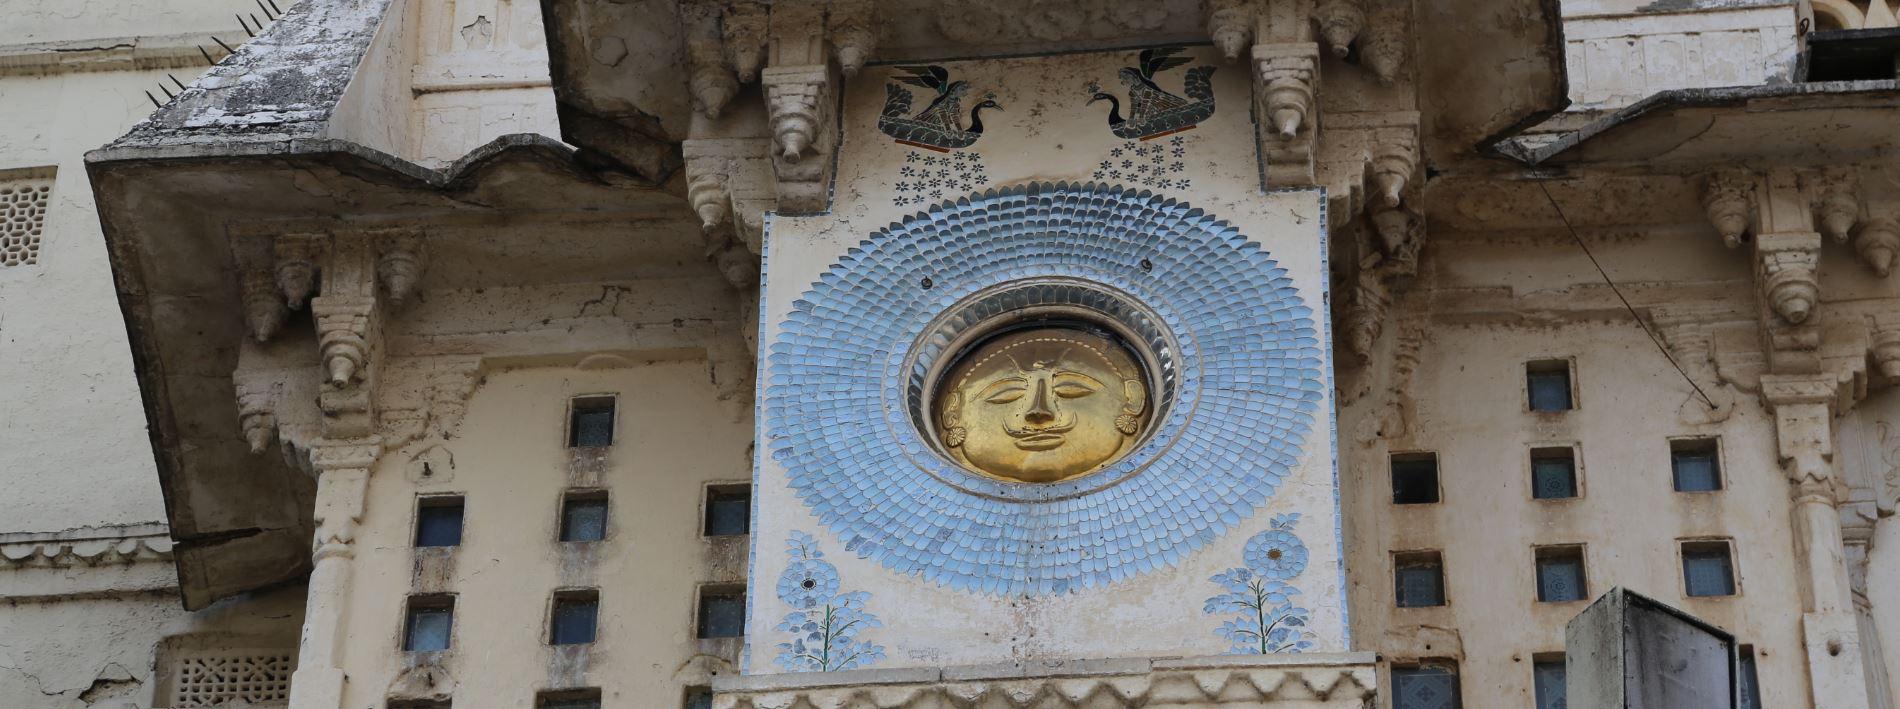 udaipur palace surya achat